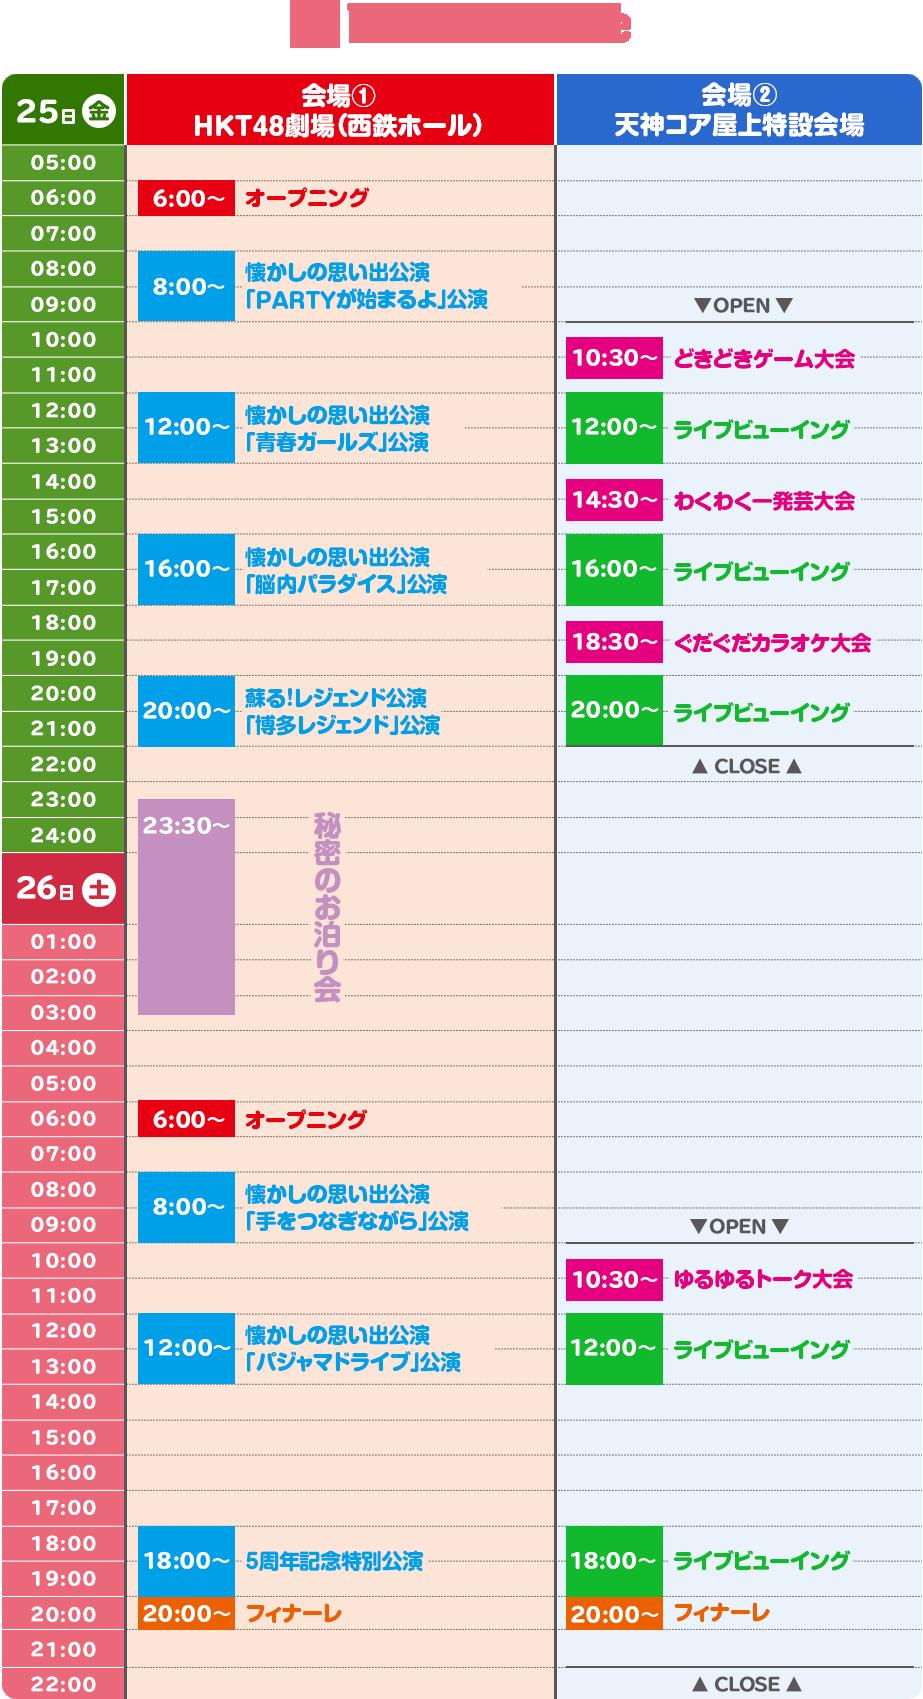 HKT48 5周年 タイムテーブル